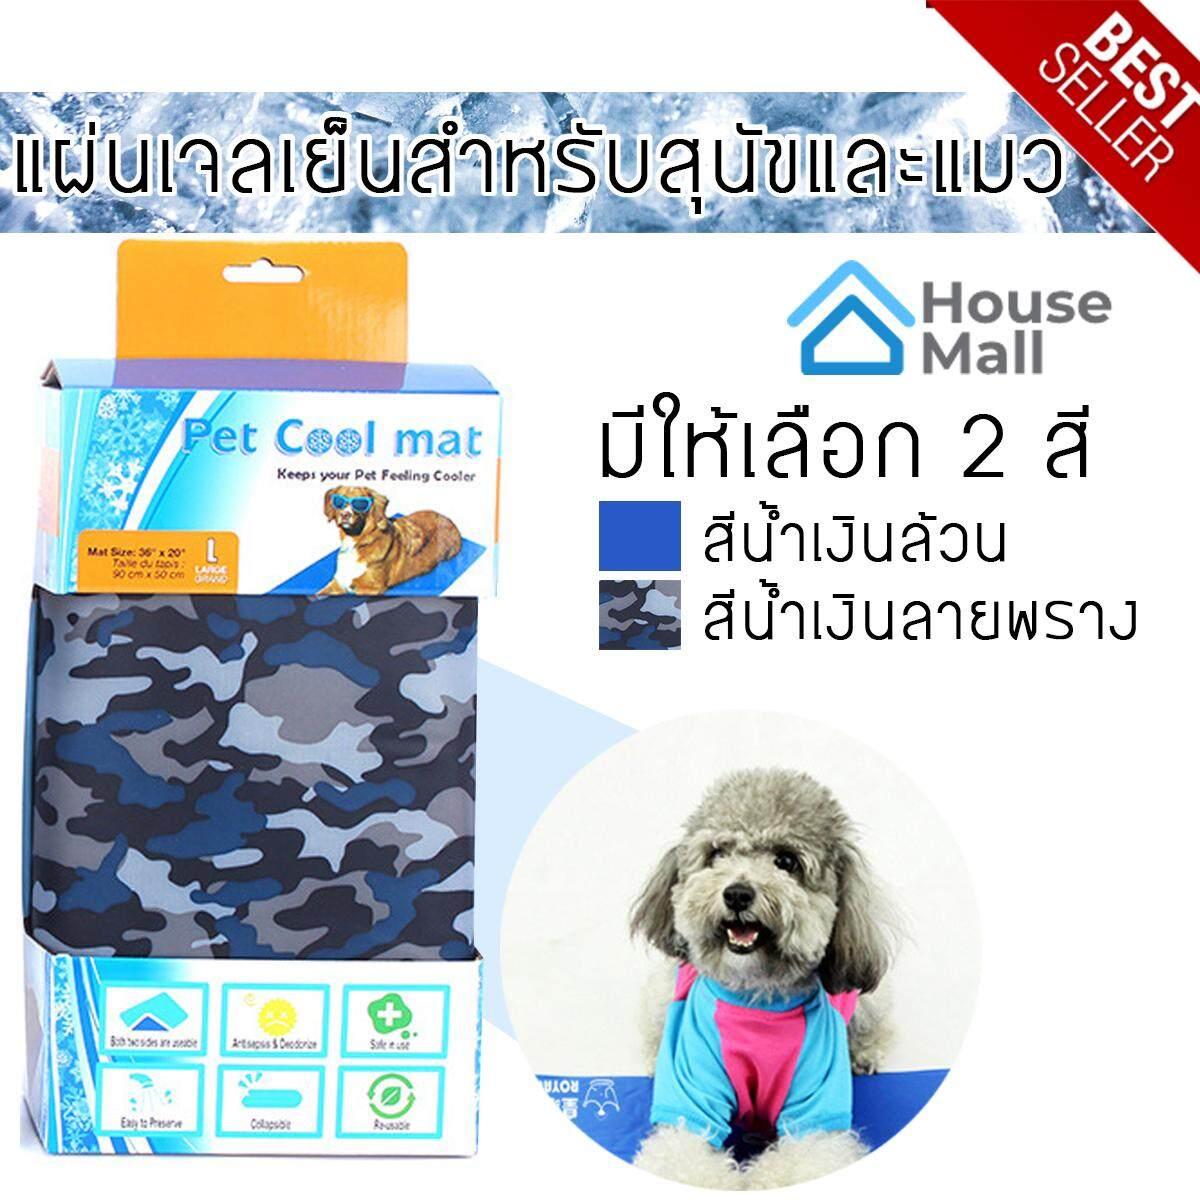 Pet Cool Mat แผ่นเจลเย็น ที่นอนเย็น เบาะนอนเย็น สำหรับสุนัขและแมว ลดความร้อนให้ความเย็น By Heng Home.